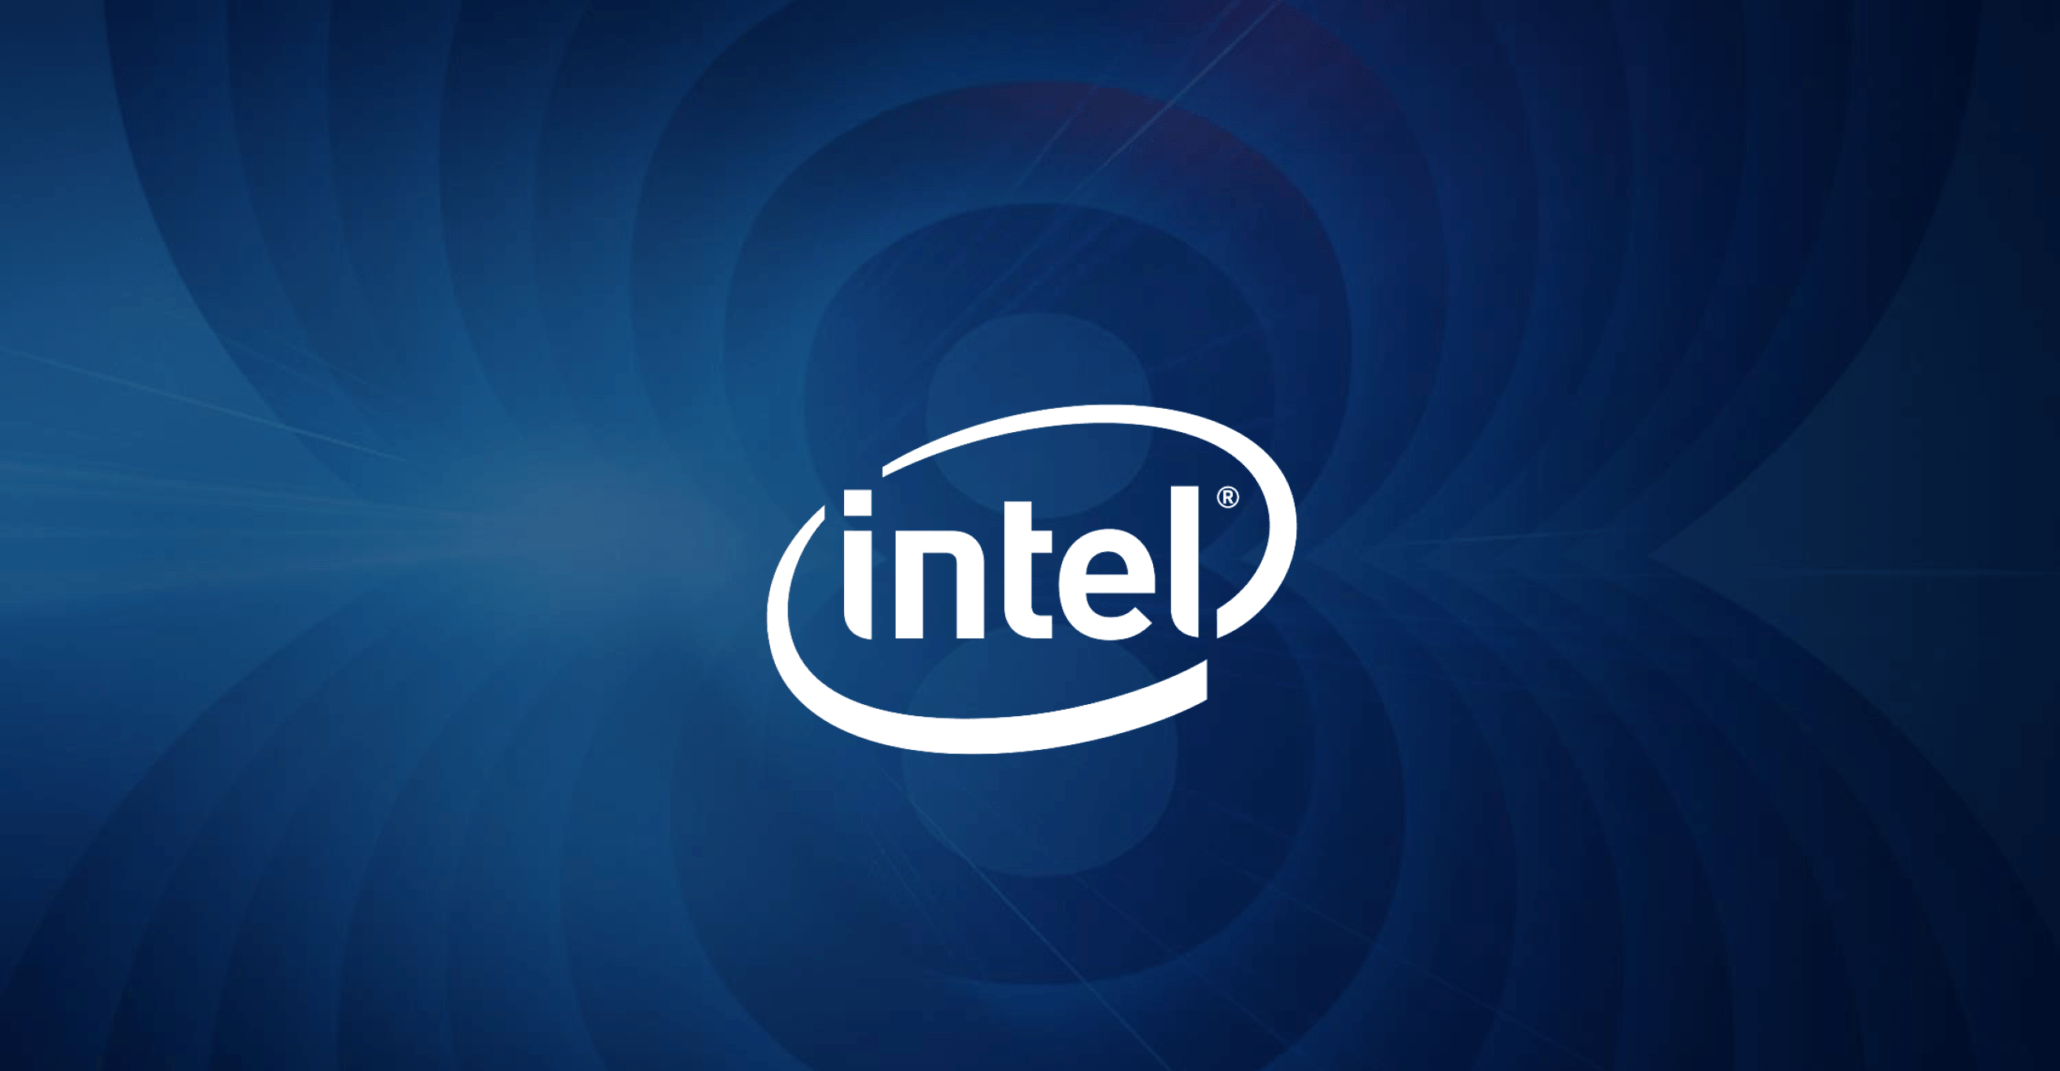 intel i5 8400, i5 8500, i5 8600 comparativa